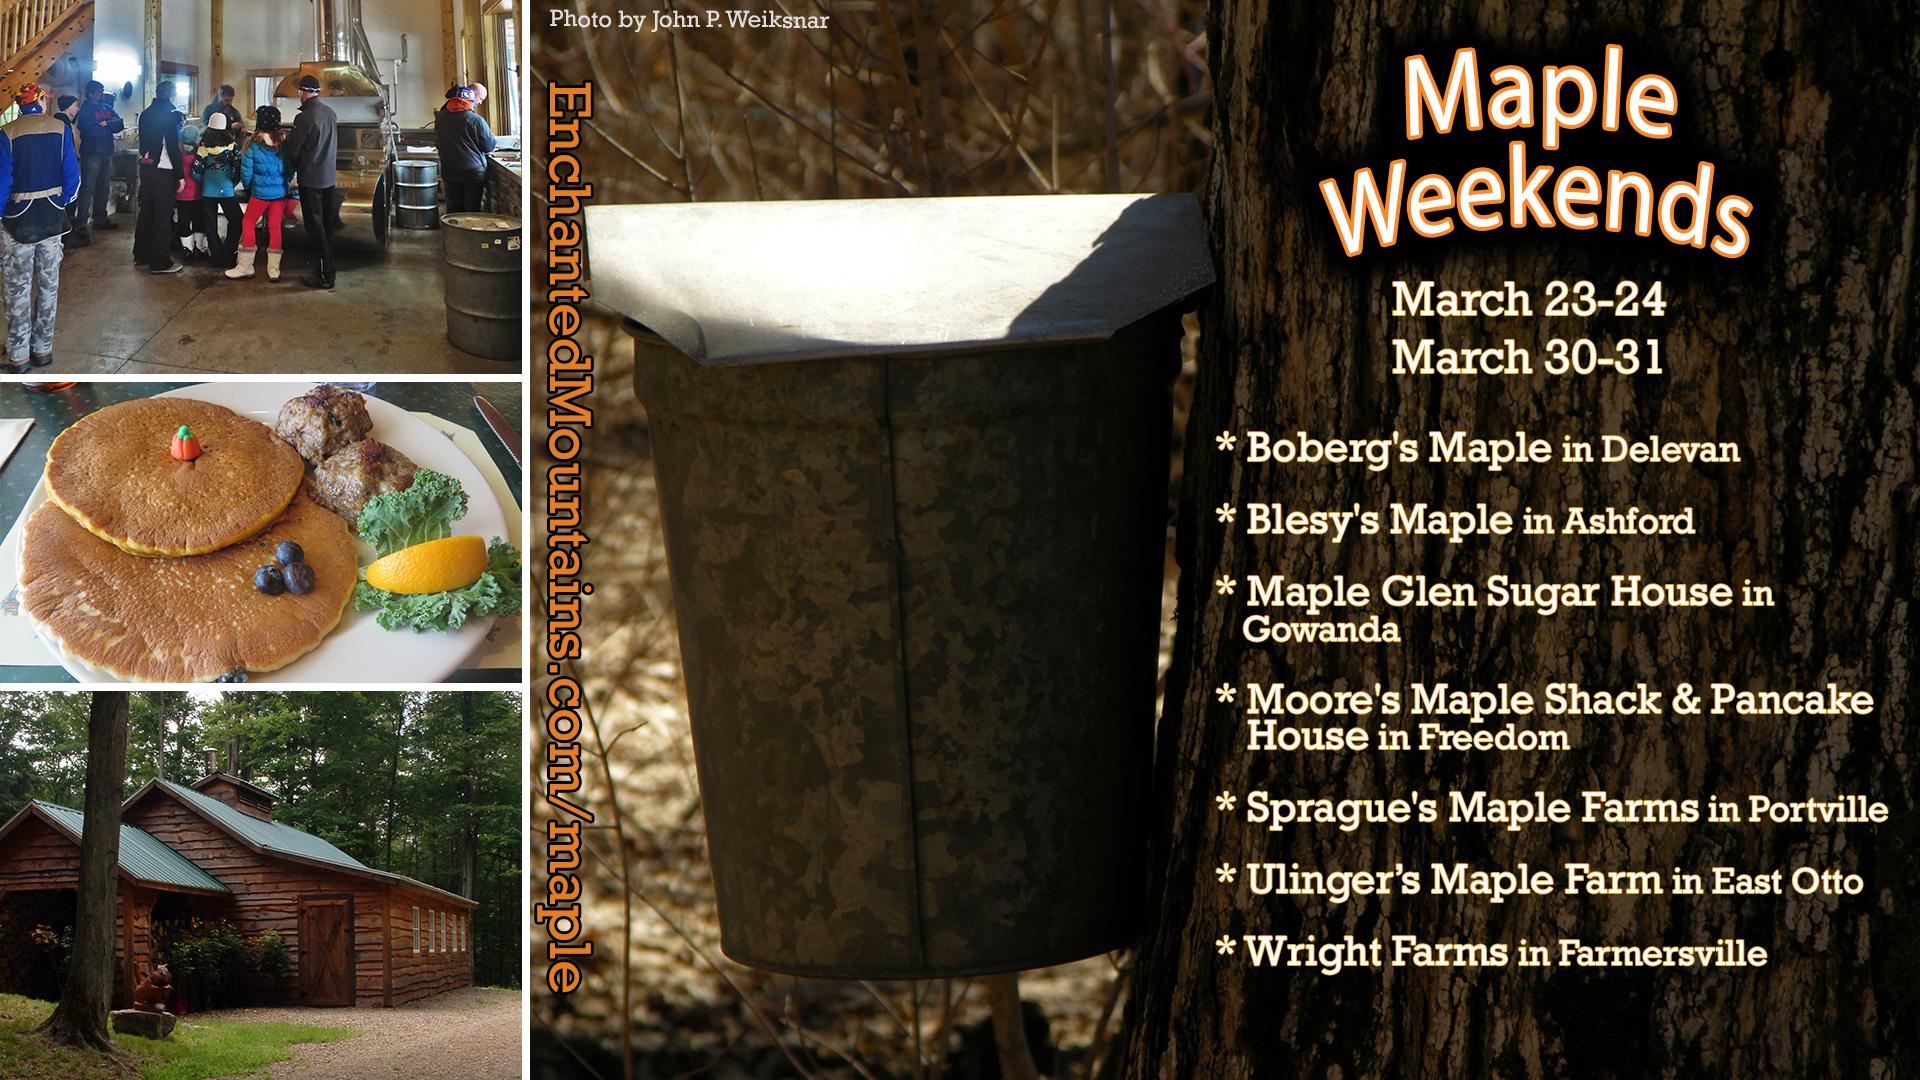 Maple Weekends 2019